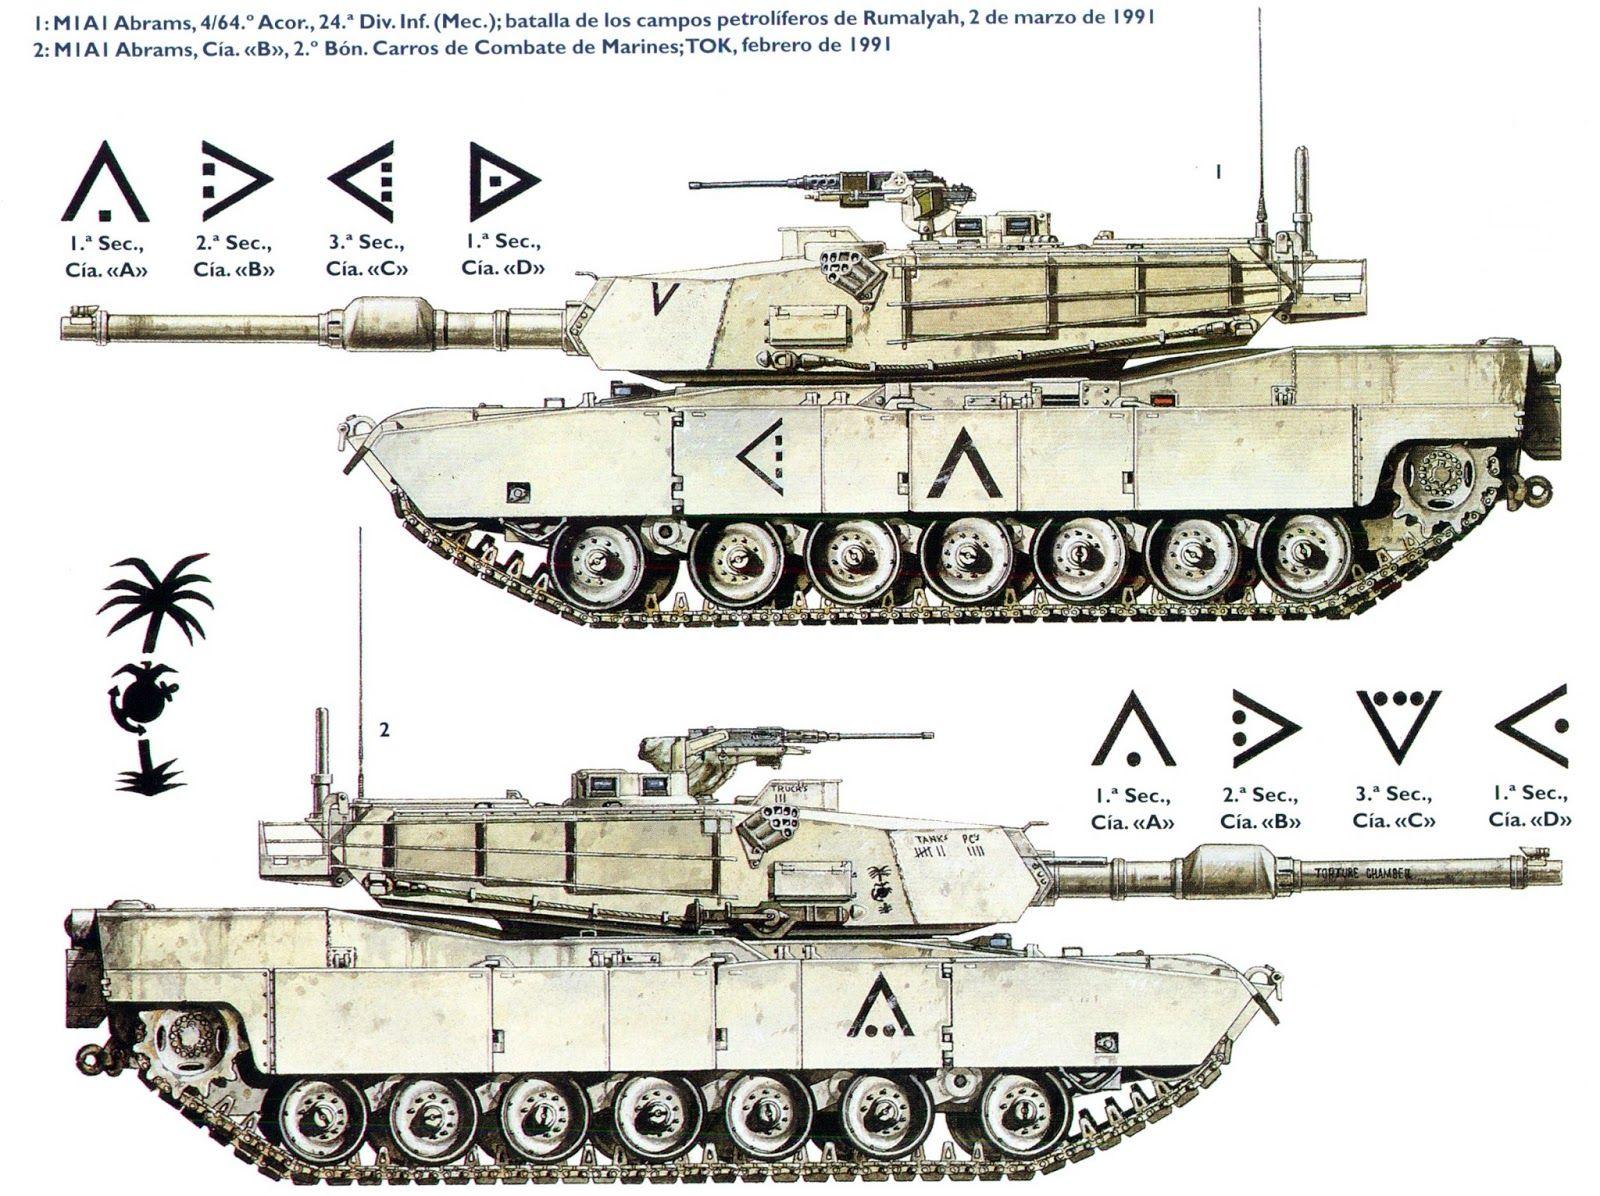 Modelismo Militar M1 Abrams Tanks Military M1 Abrams Army Vehicles